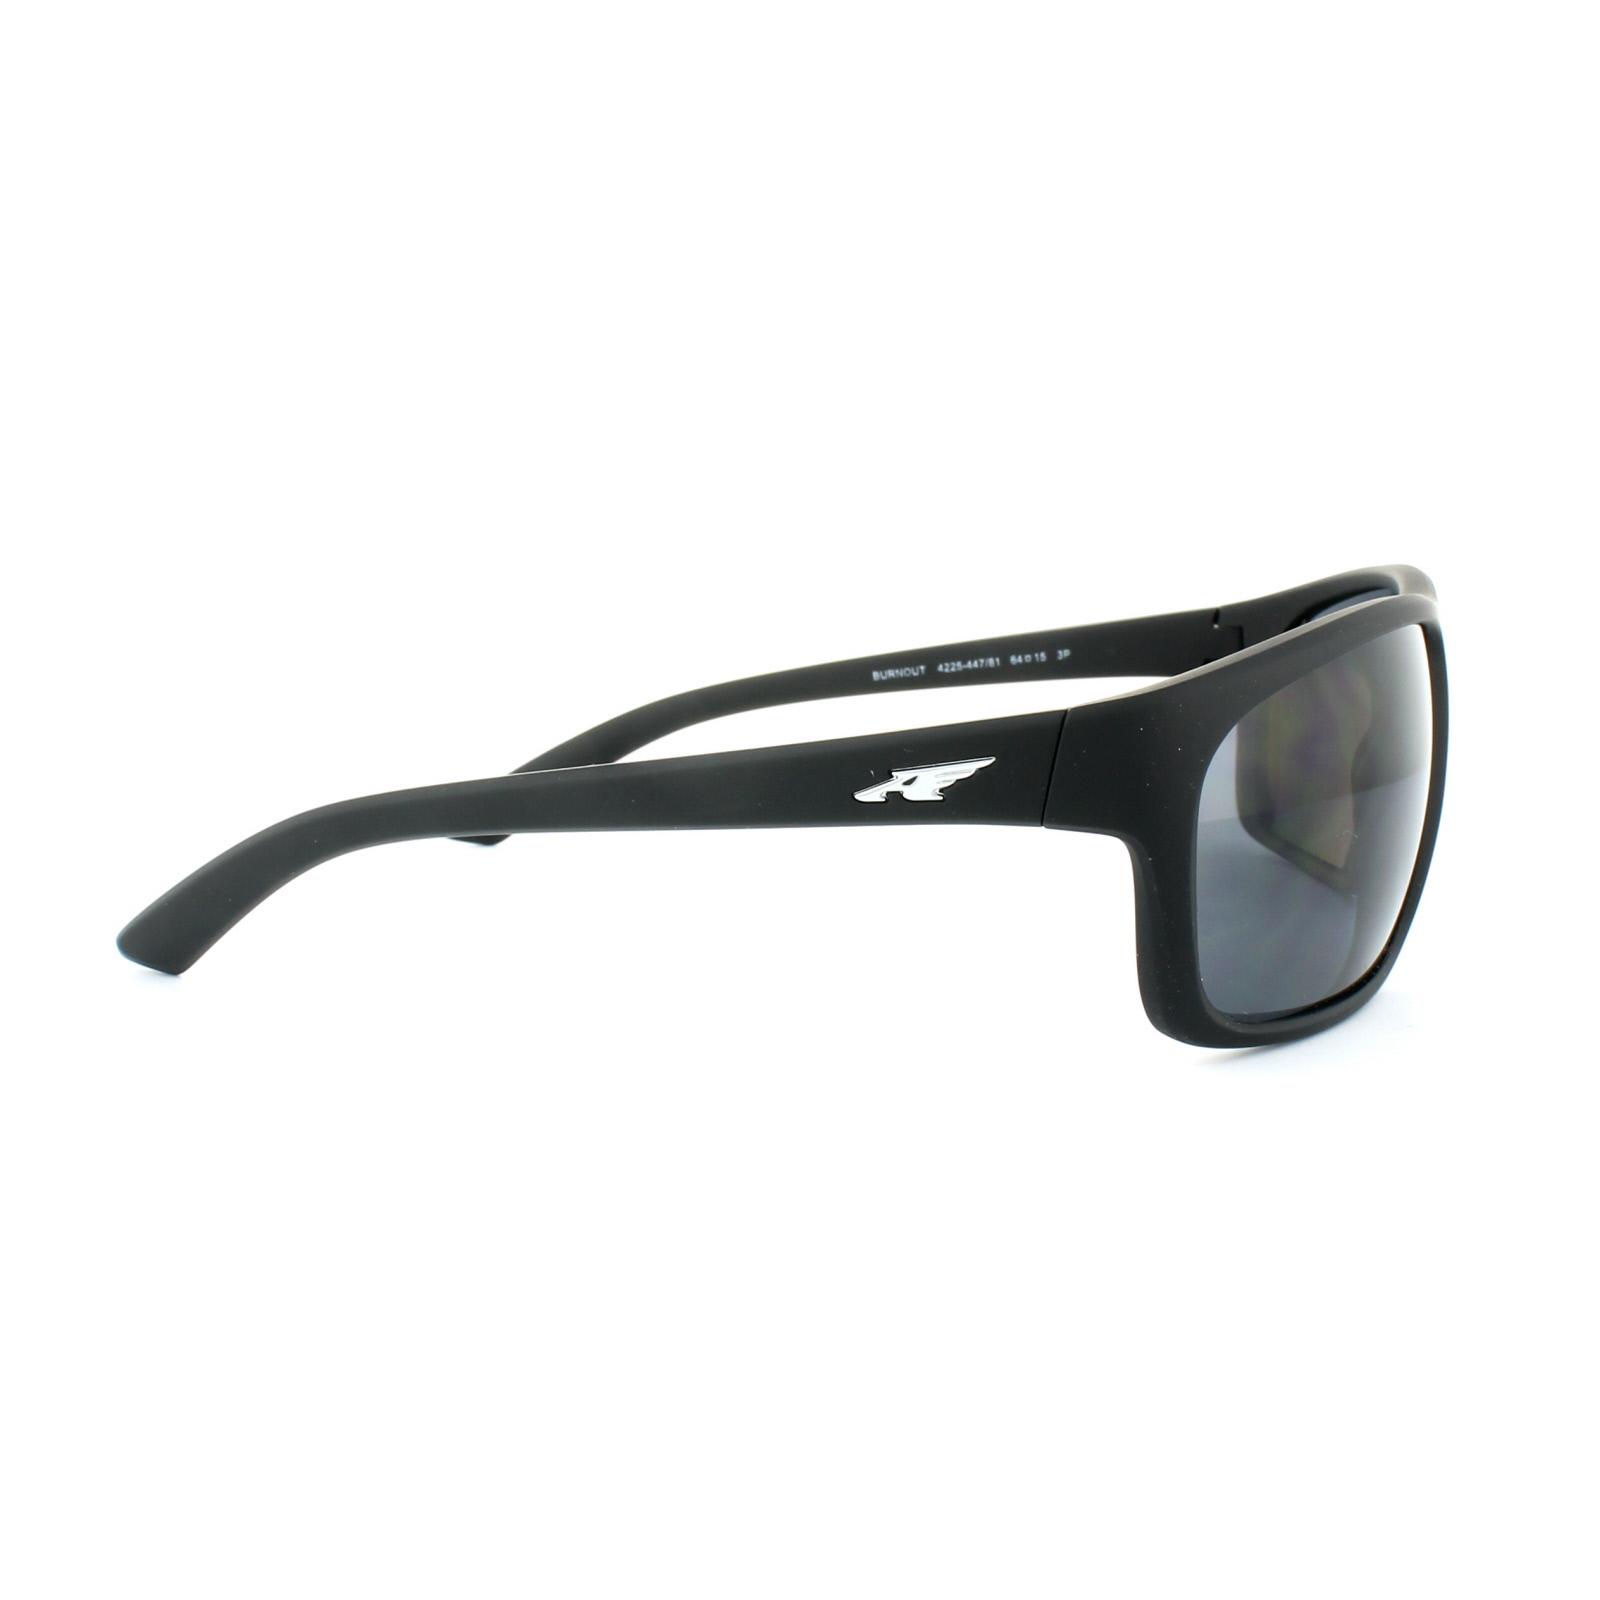 0842cf32f55 Sentinel Arnette Sunglasses 4225 Burnout 447 81 Fuzzy Black Grey Polarized